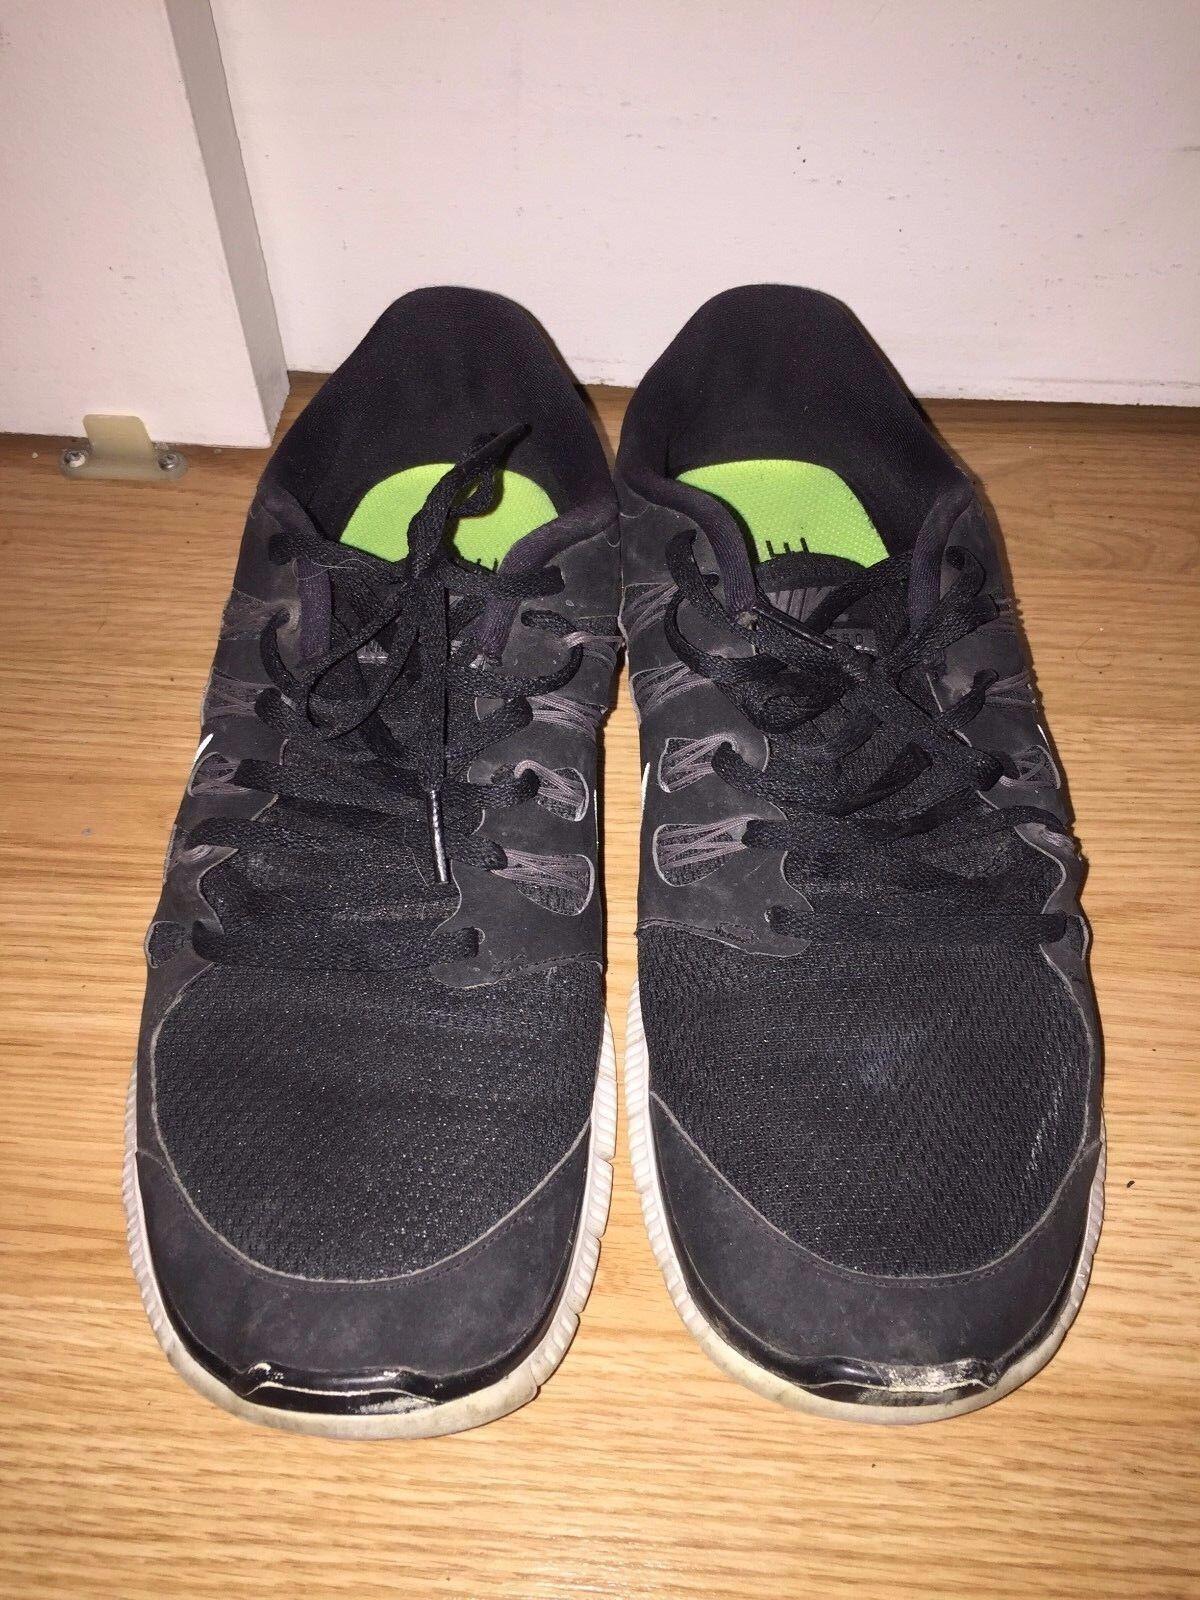 Used running shoe Nike Free 5.0  Casual wild